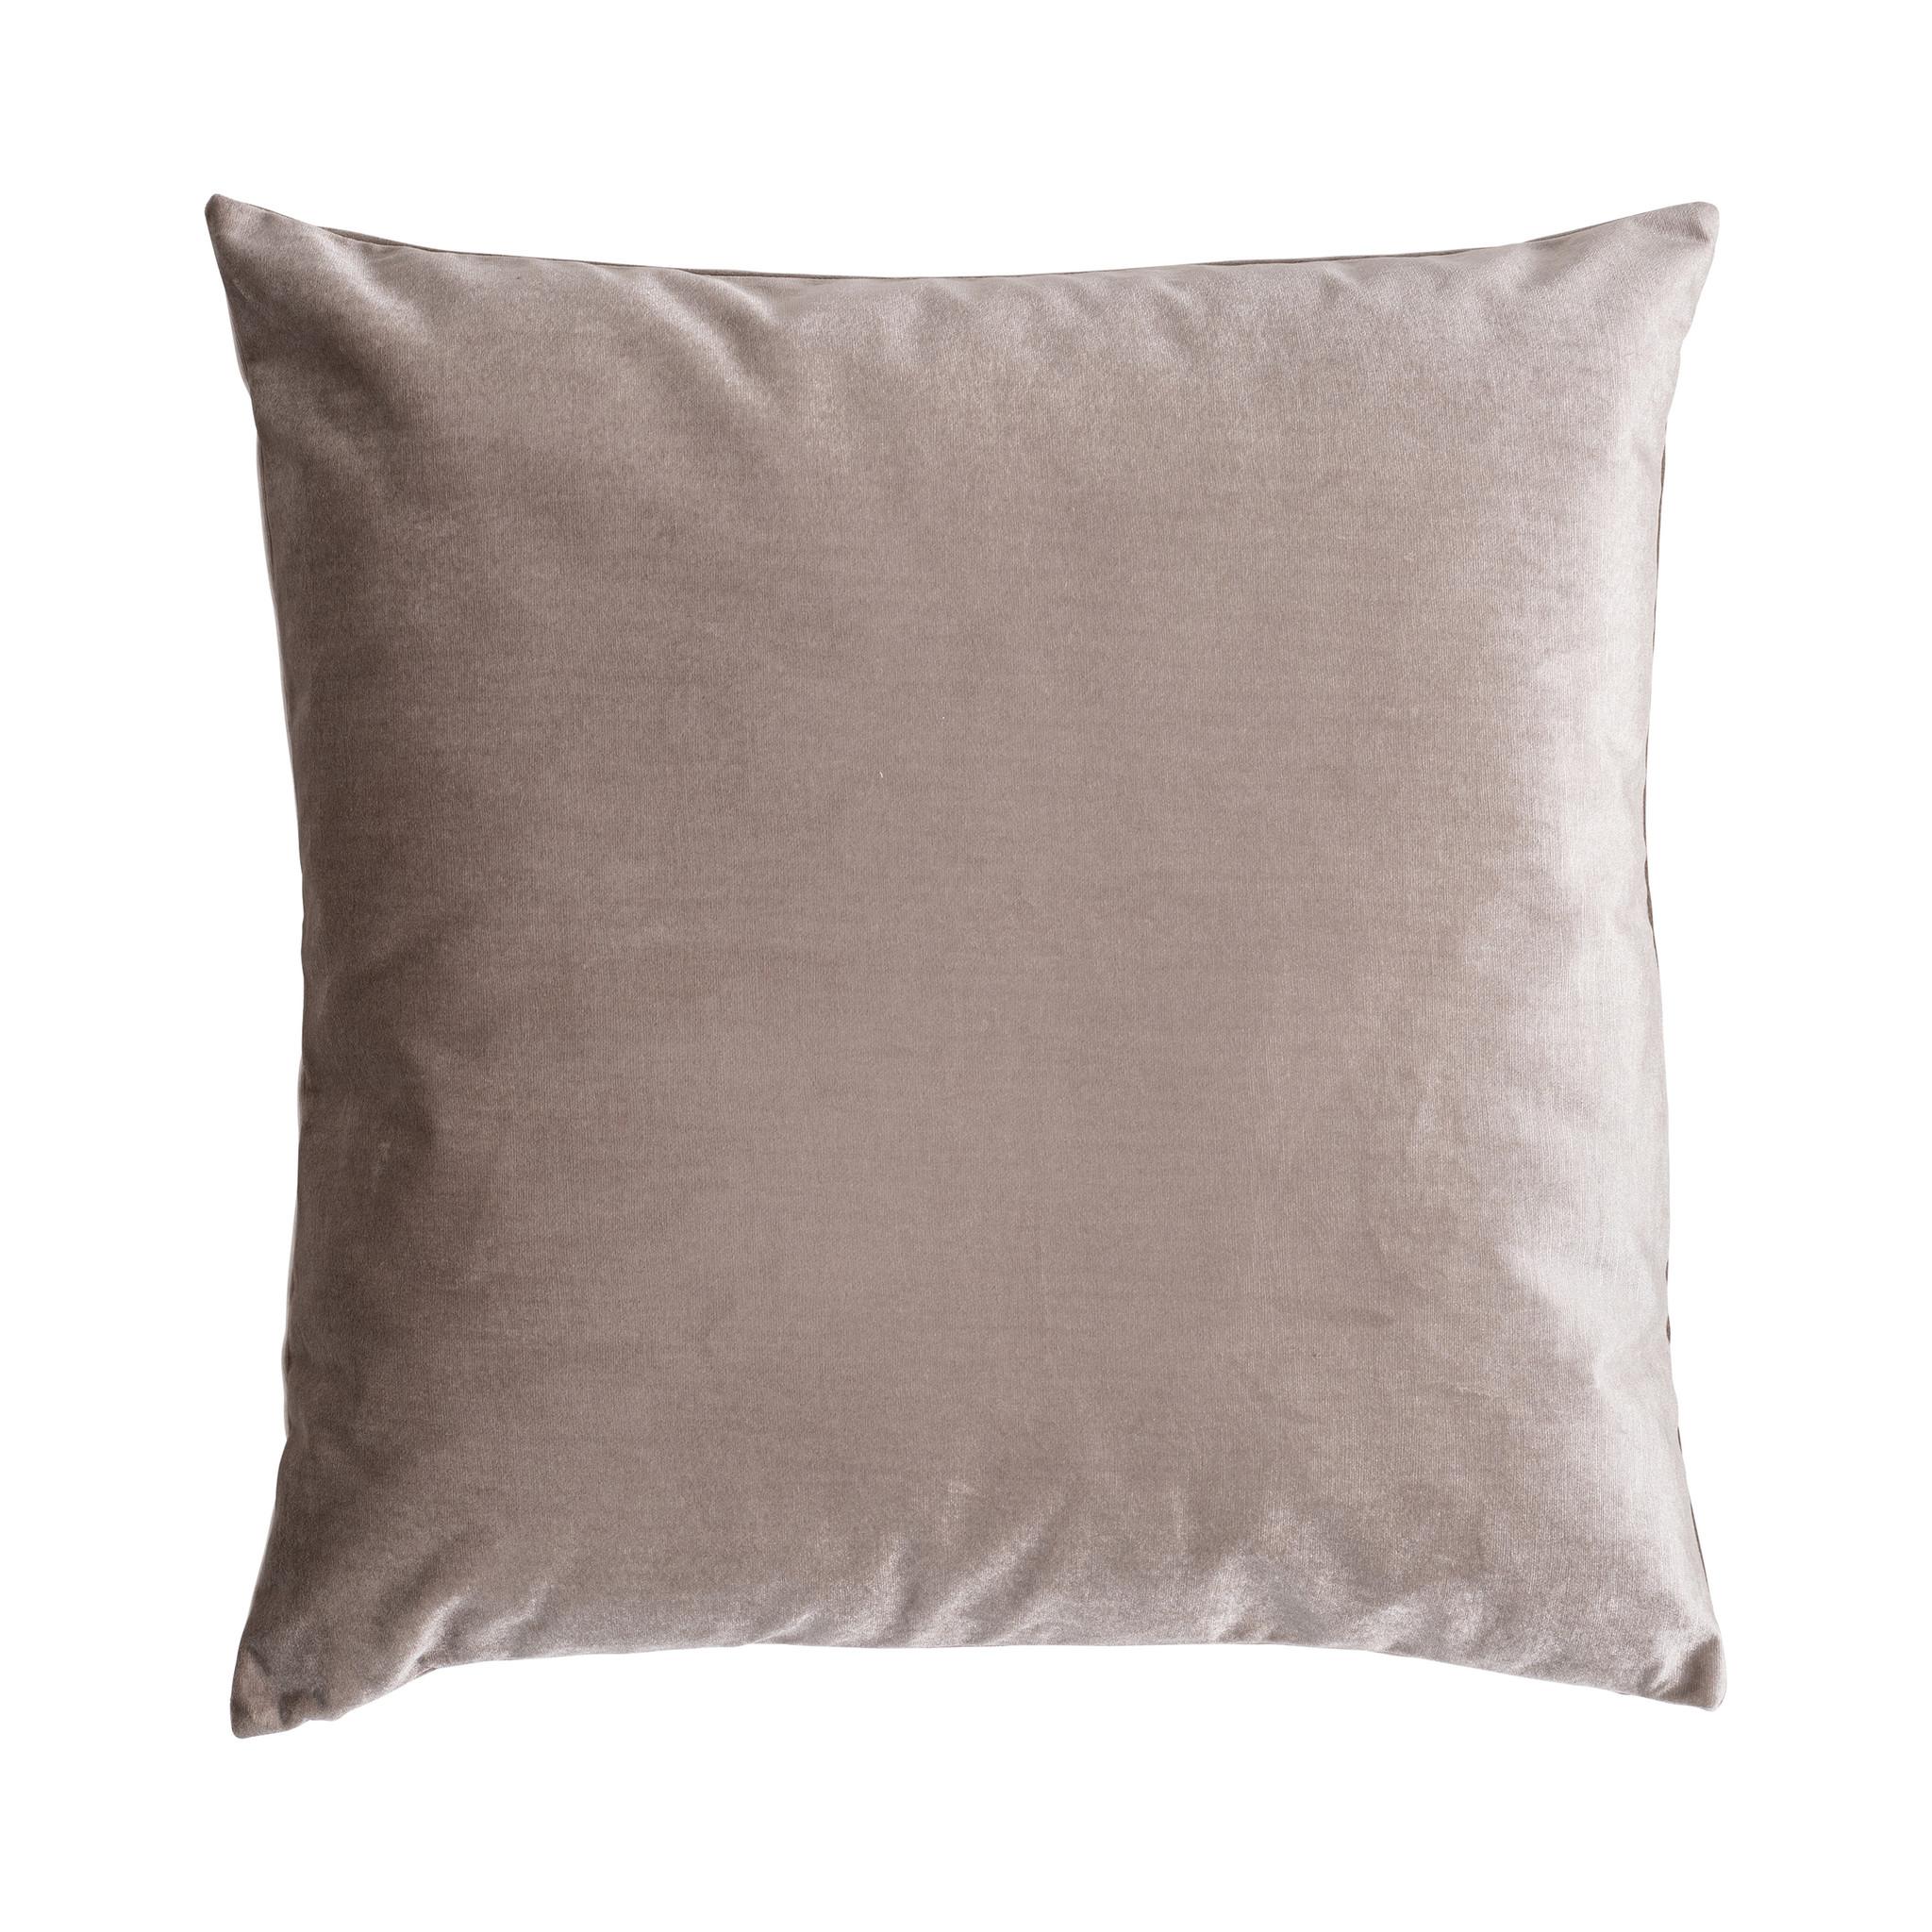 Presence Sierkussenhoes Nola - Warm grijs 60 x 60 cm